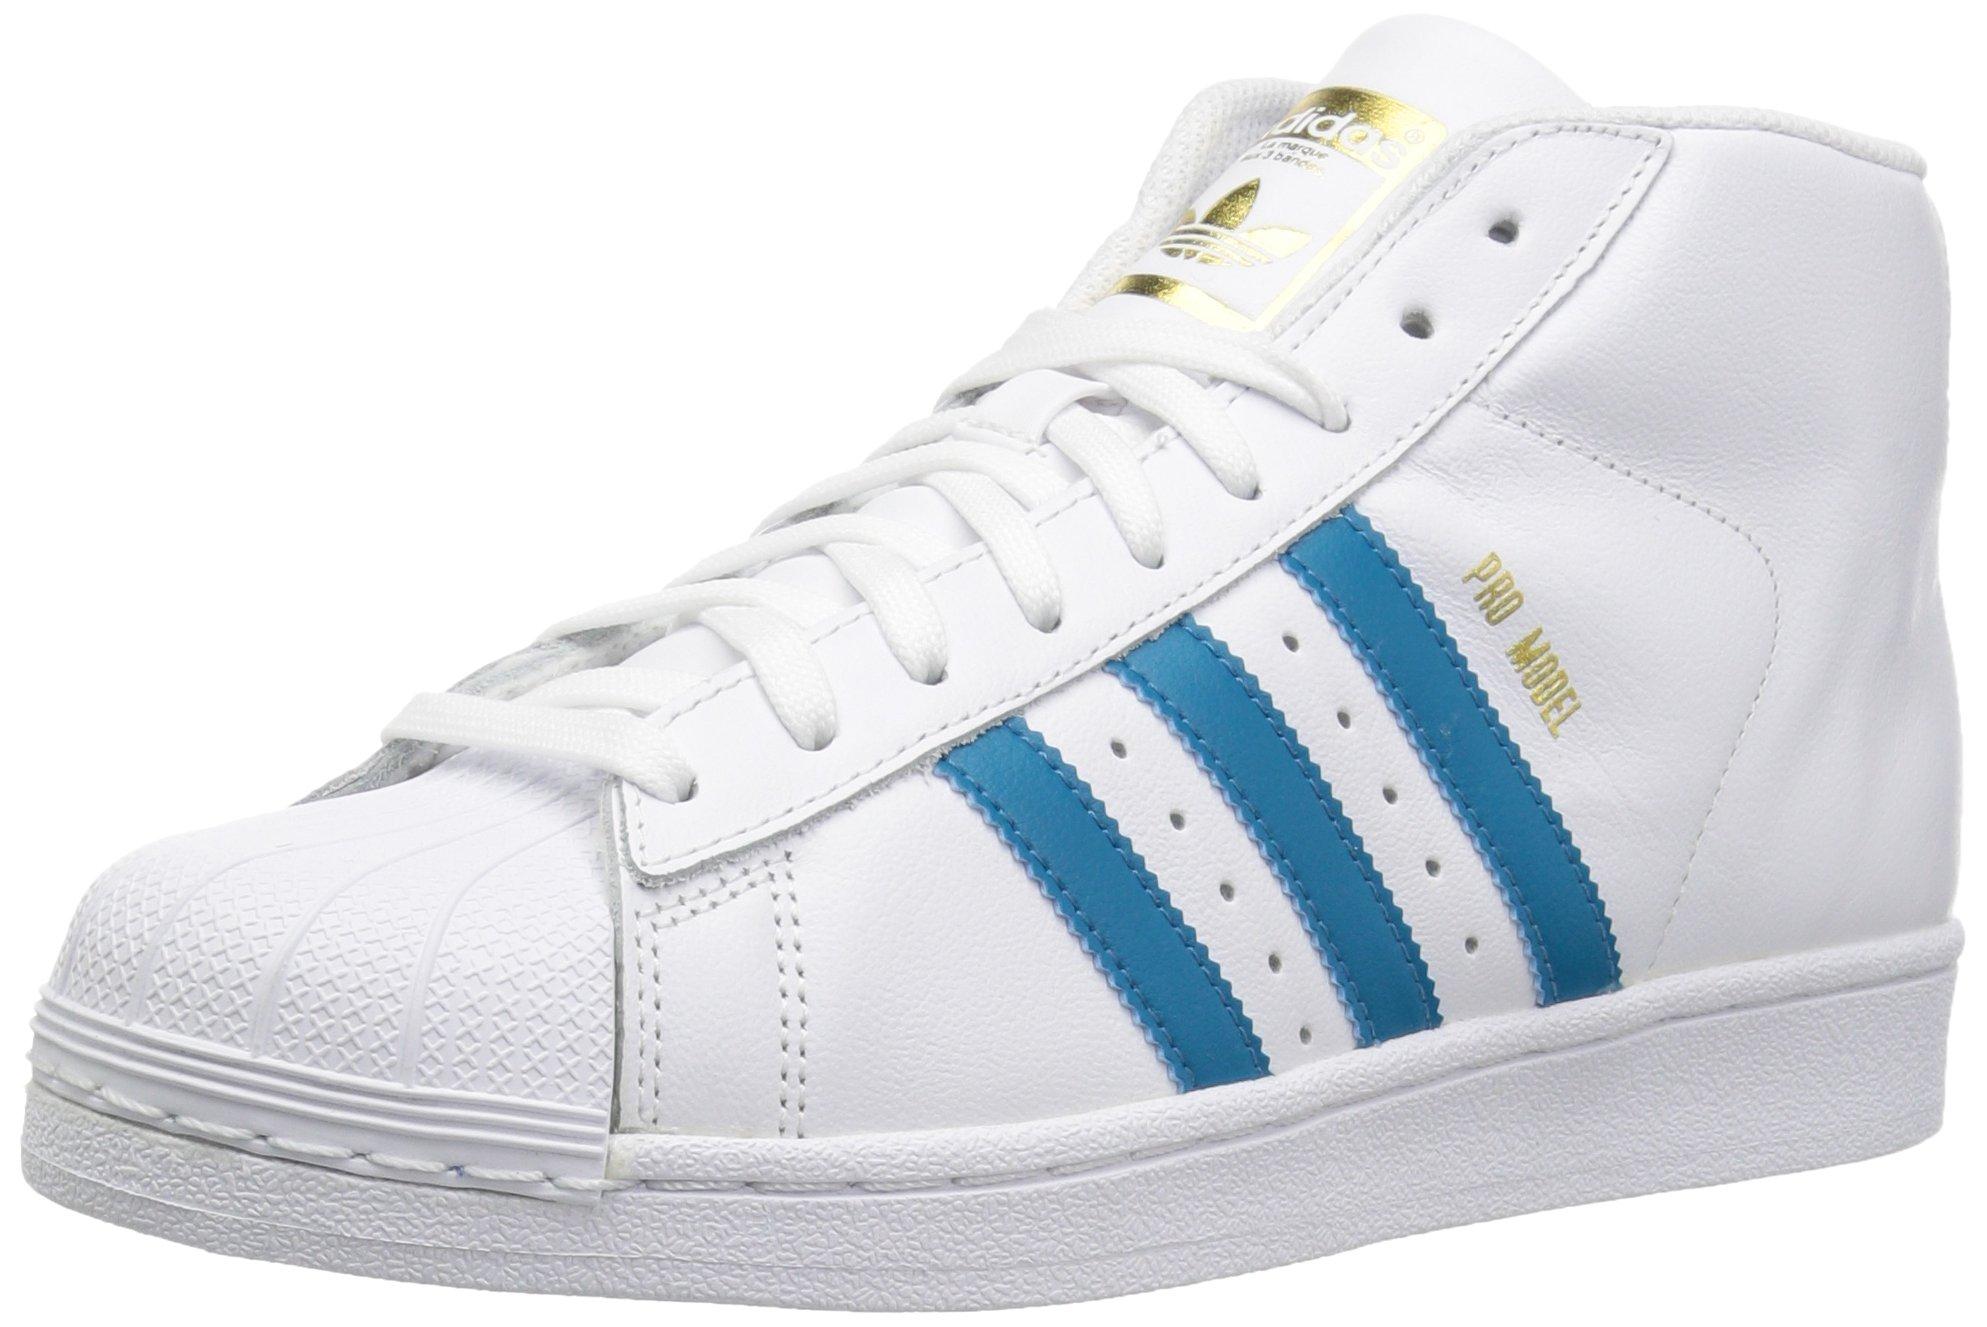 adidas Originals Boys' PRO Model J Running Shoe, White/Mystery Petrol/Metallic Gold, 4 Medium US Big Kid